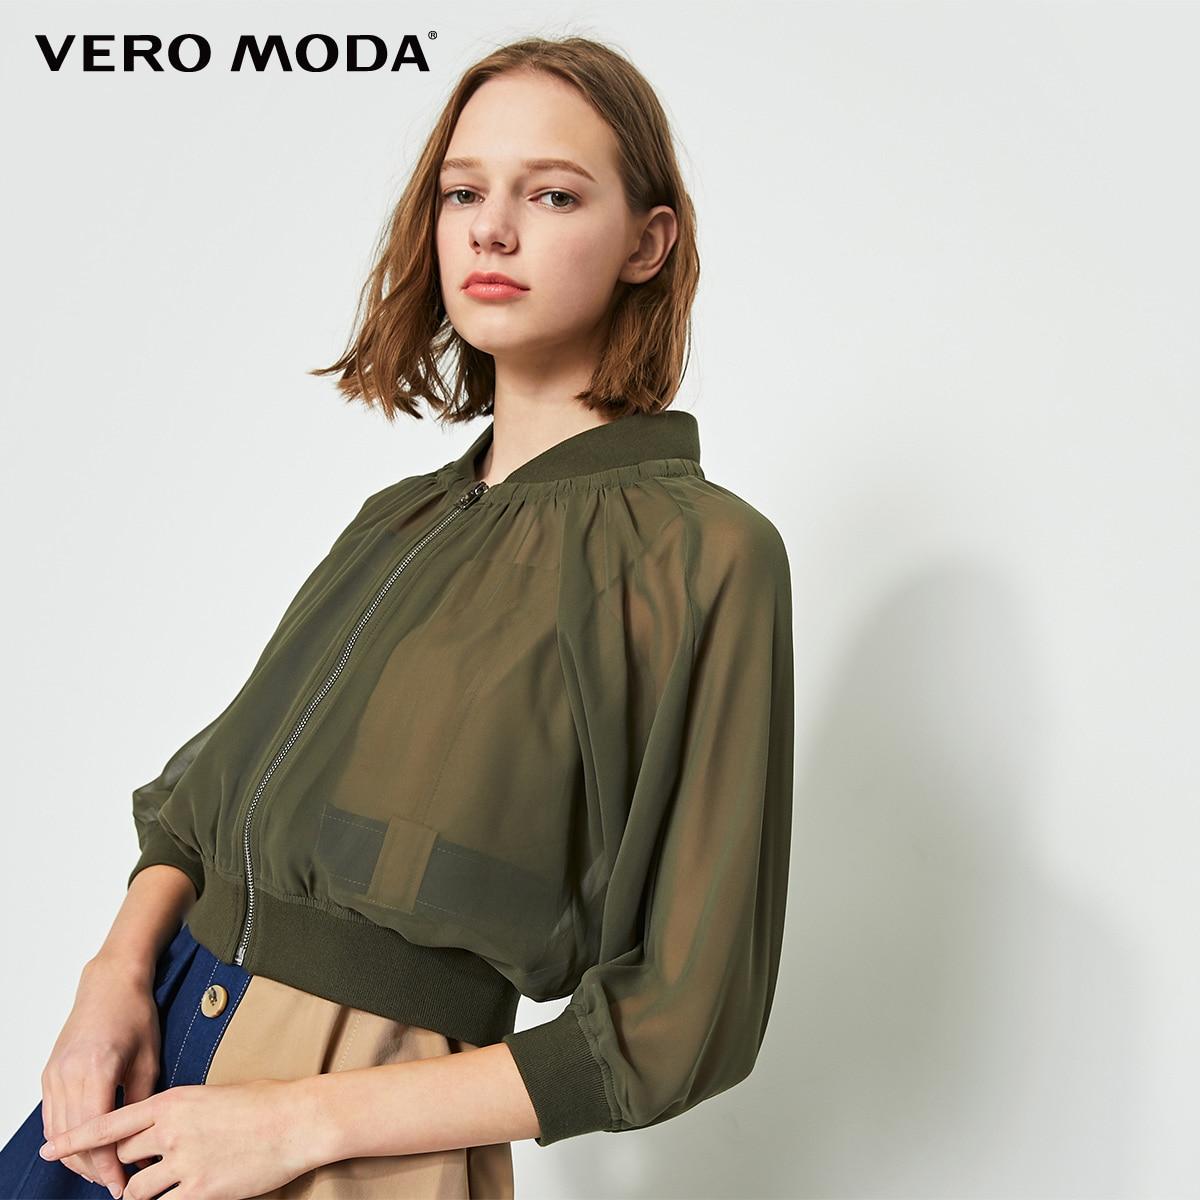 Vero Moda Women's Ribbed Cuffs Zipped Gauzy Jacket | 319117507